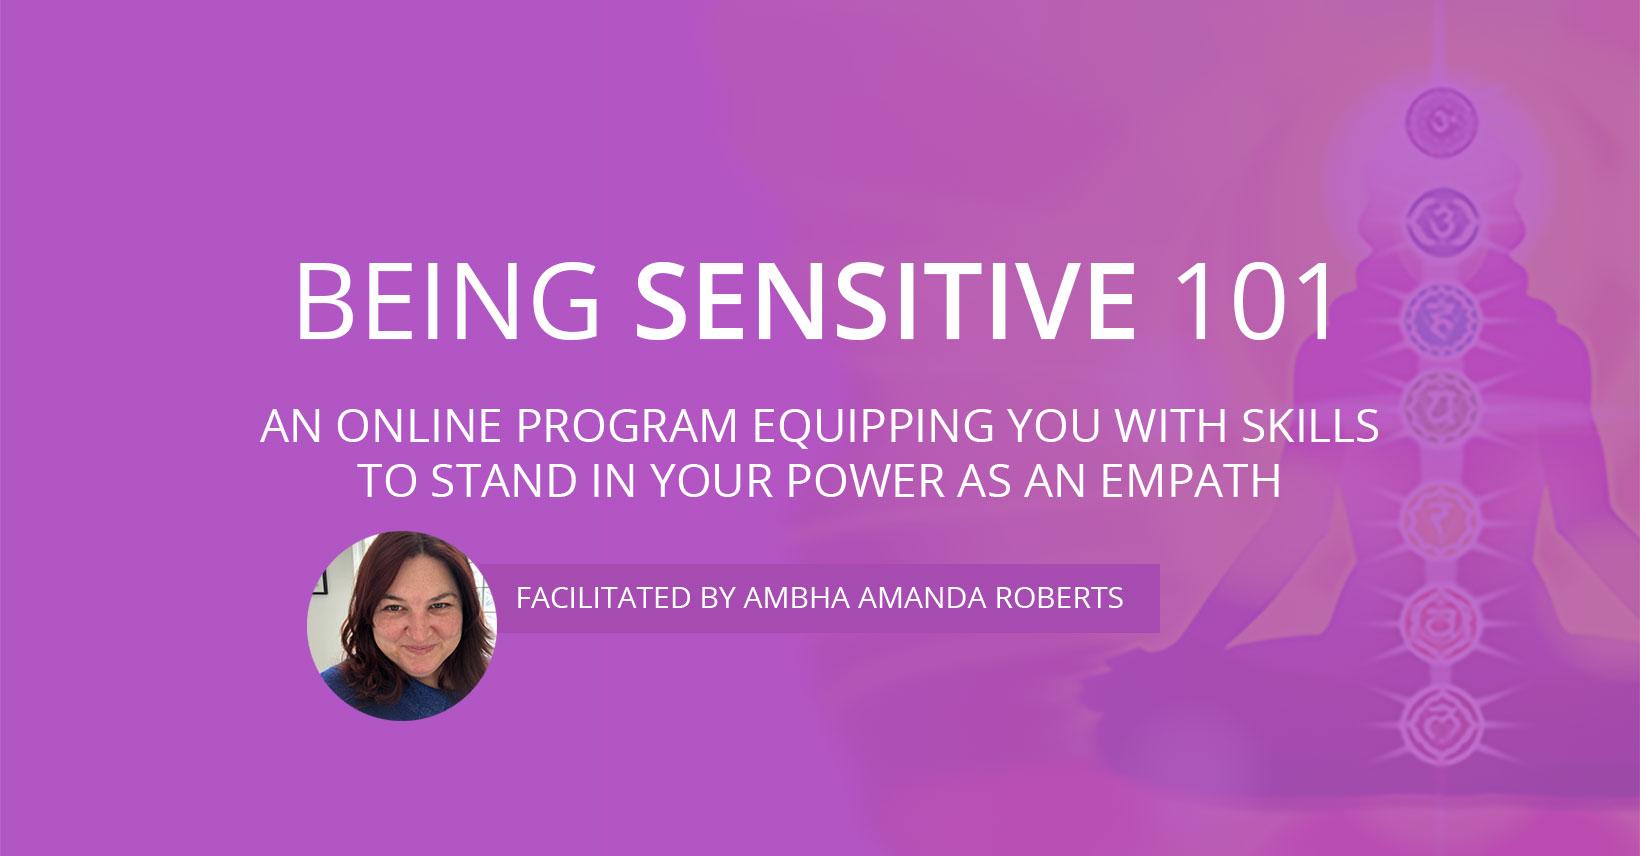 The Being Sensitive 101 program